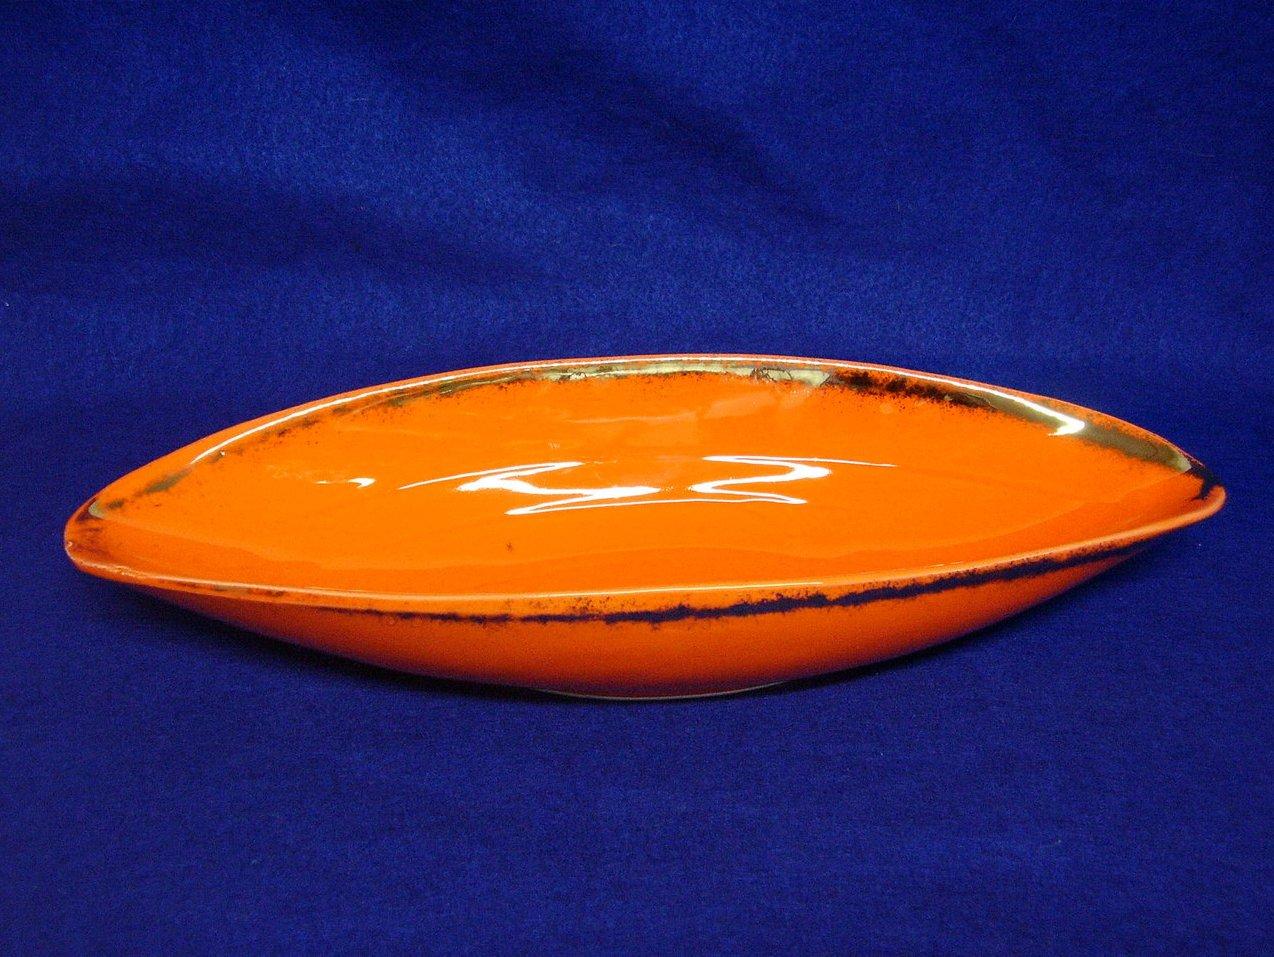 '.California USA Orange dish.'